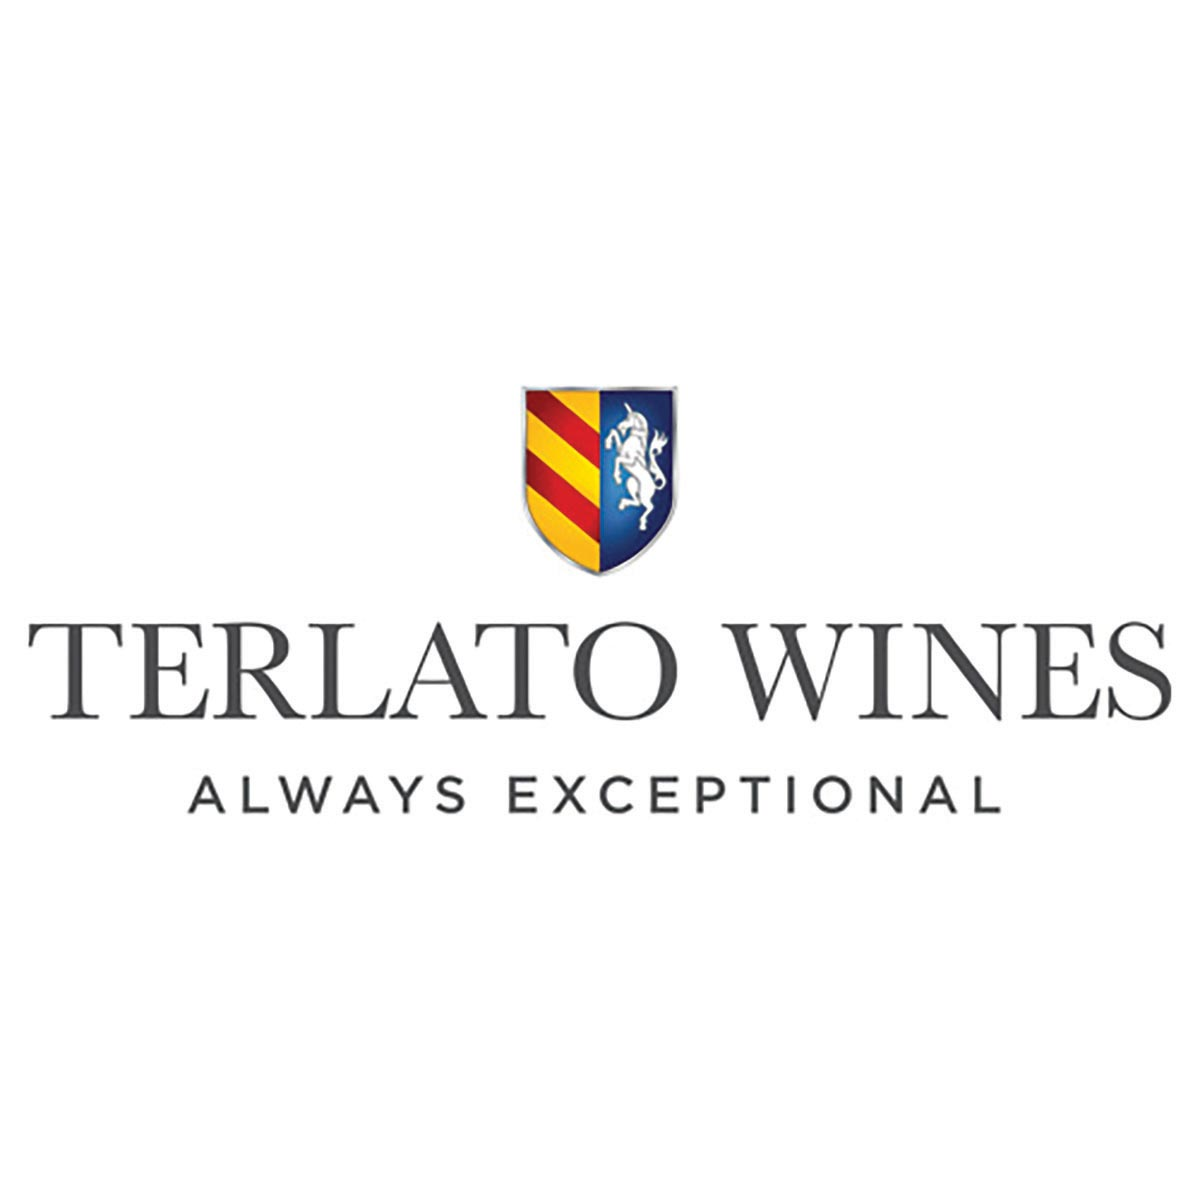 Terlato Wines Hires Cerio for Operations